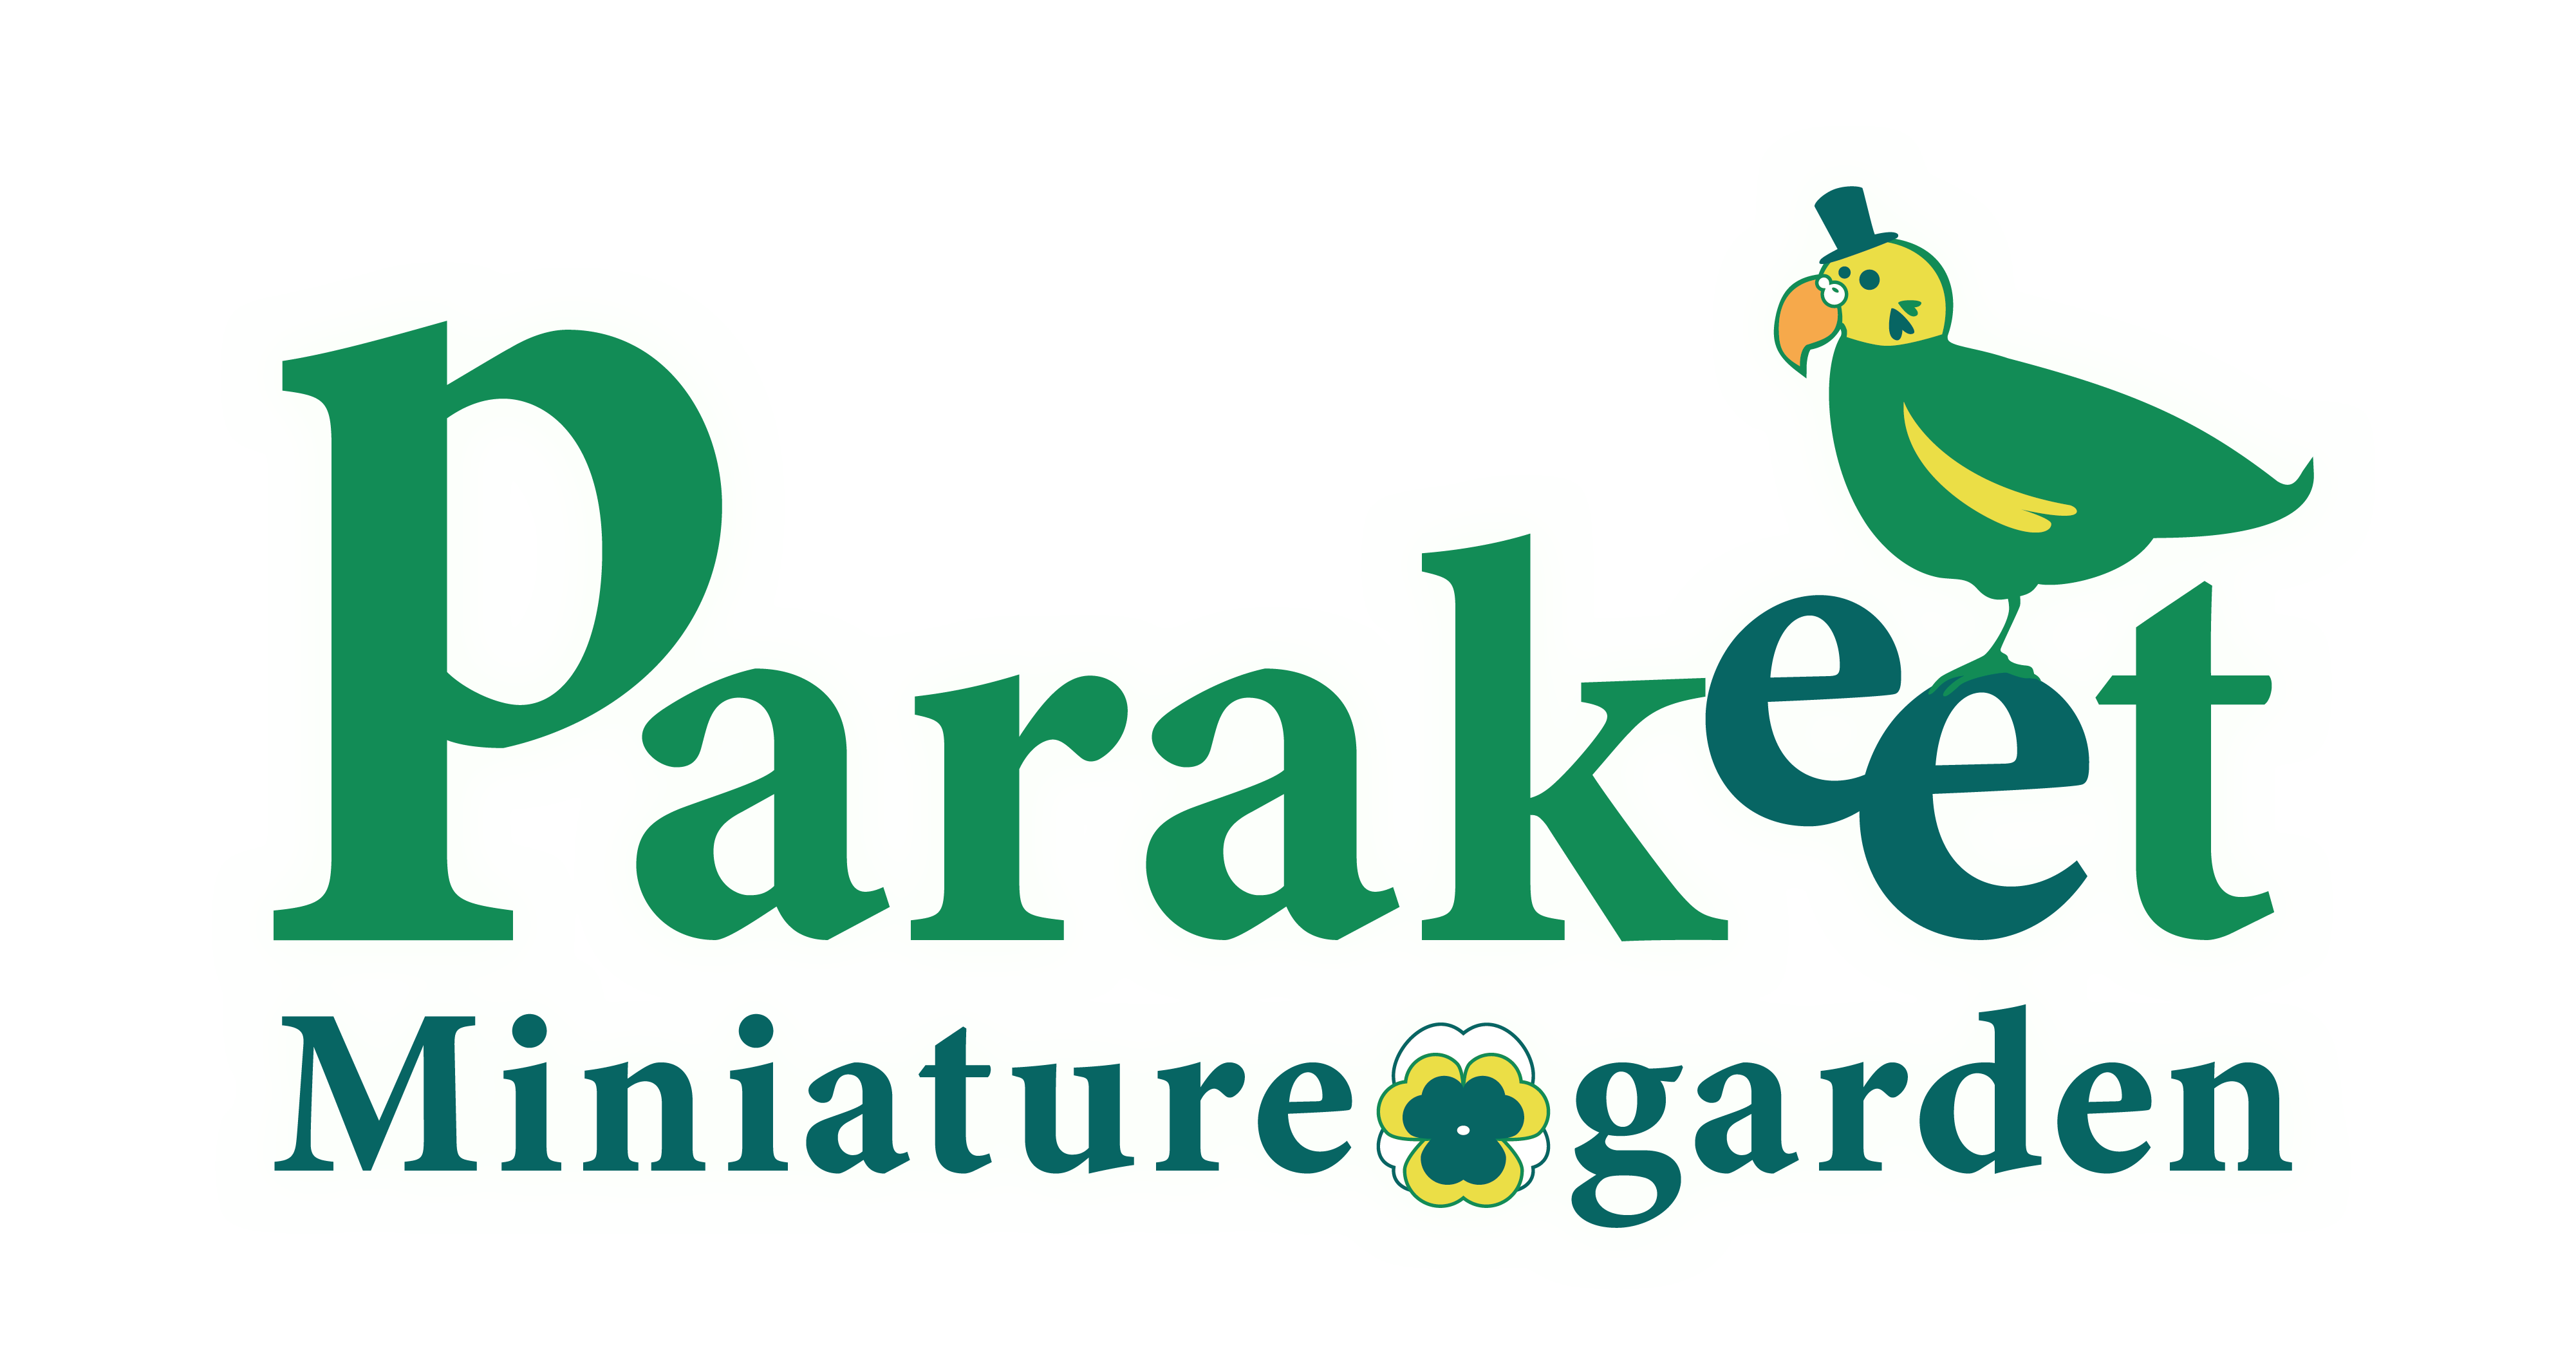 studio parakeet(スタジオ パラキート)| 水彩画 アートパネル・雑貨 の通販